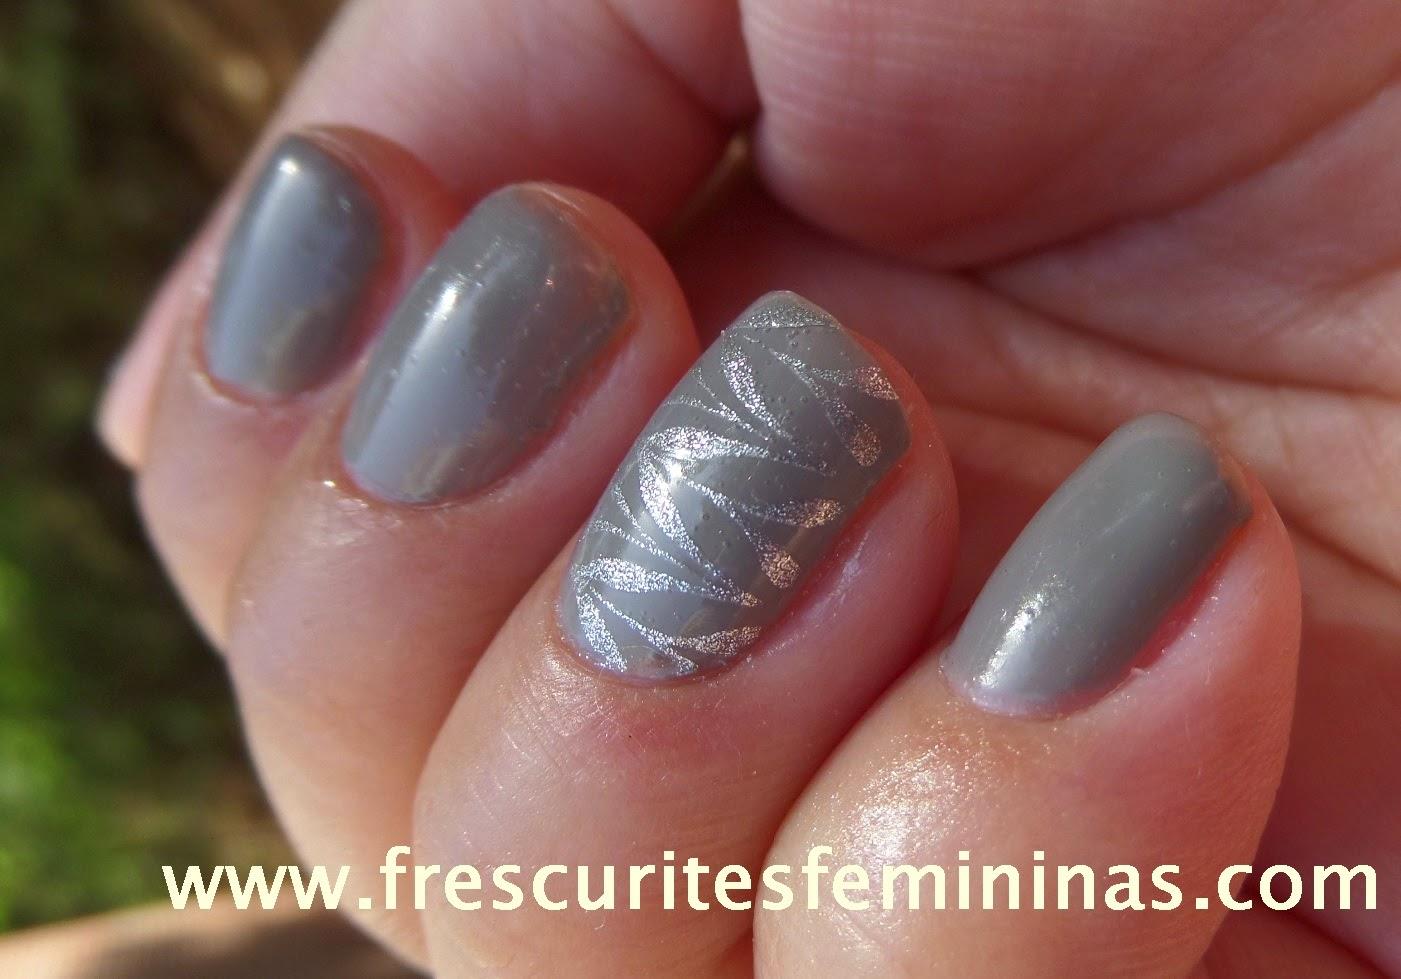 Frescurites femininas, Nail Stamp, Born Pretty Store